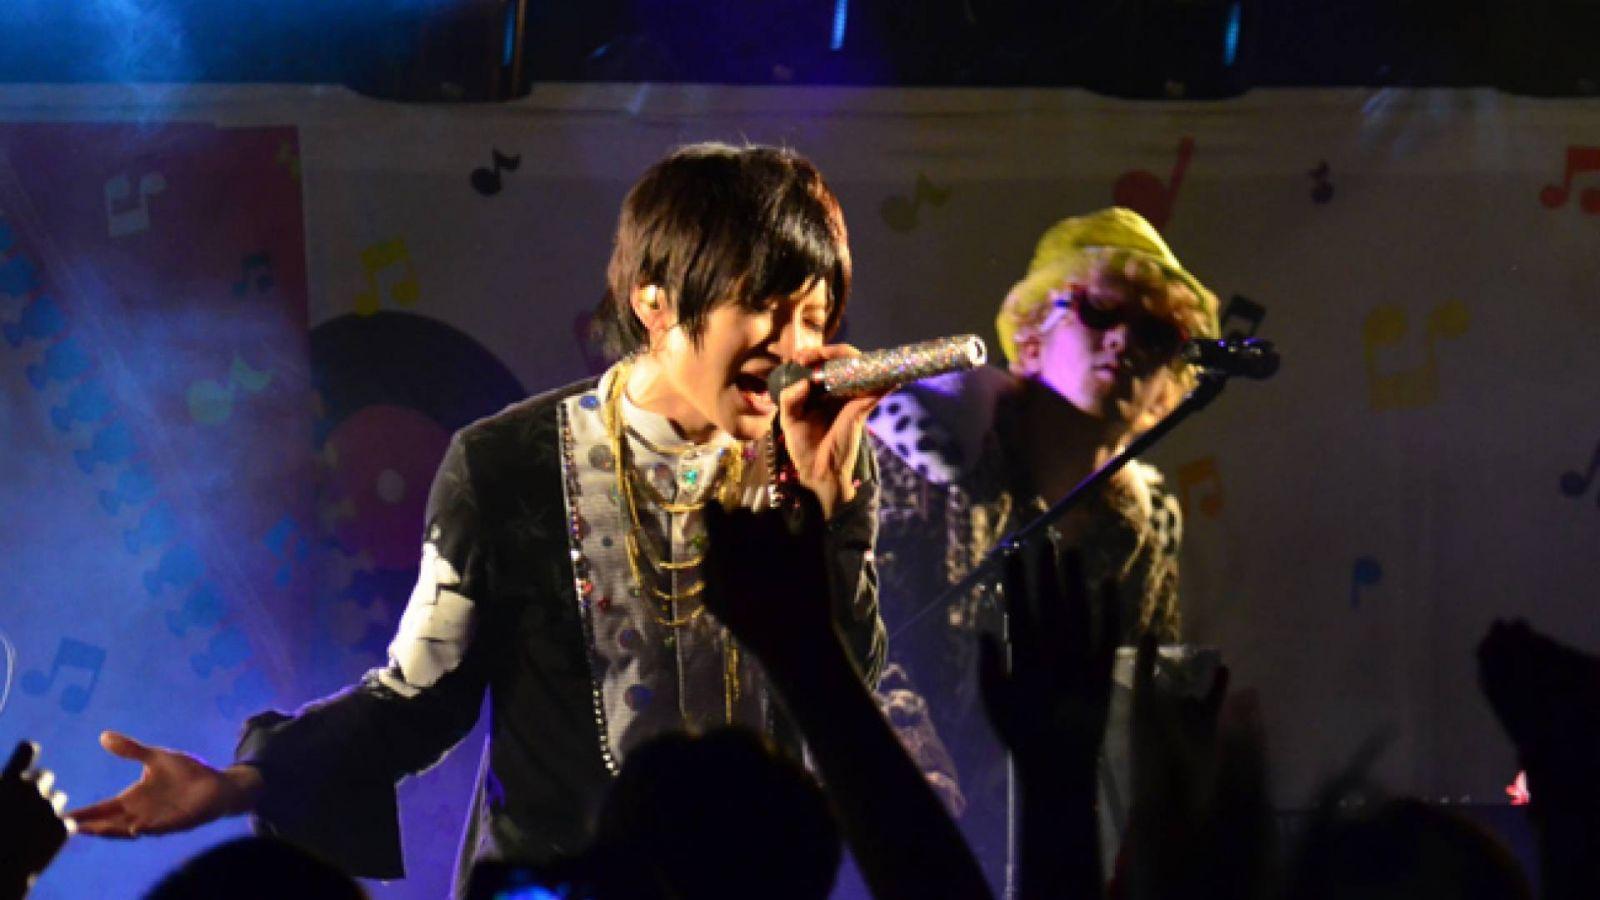 LIVE CAFE TOUR 2014 NYAPPY GO AROUND THE WORLD IV ~kawaii Cafekko AISHITERU~ in London © Agata 'andi' Paz